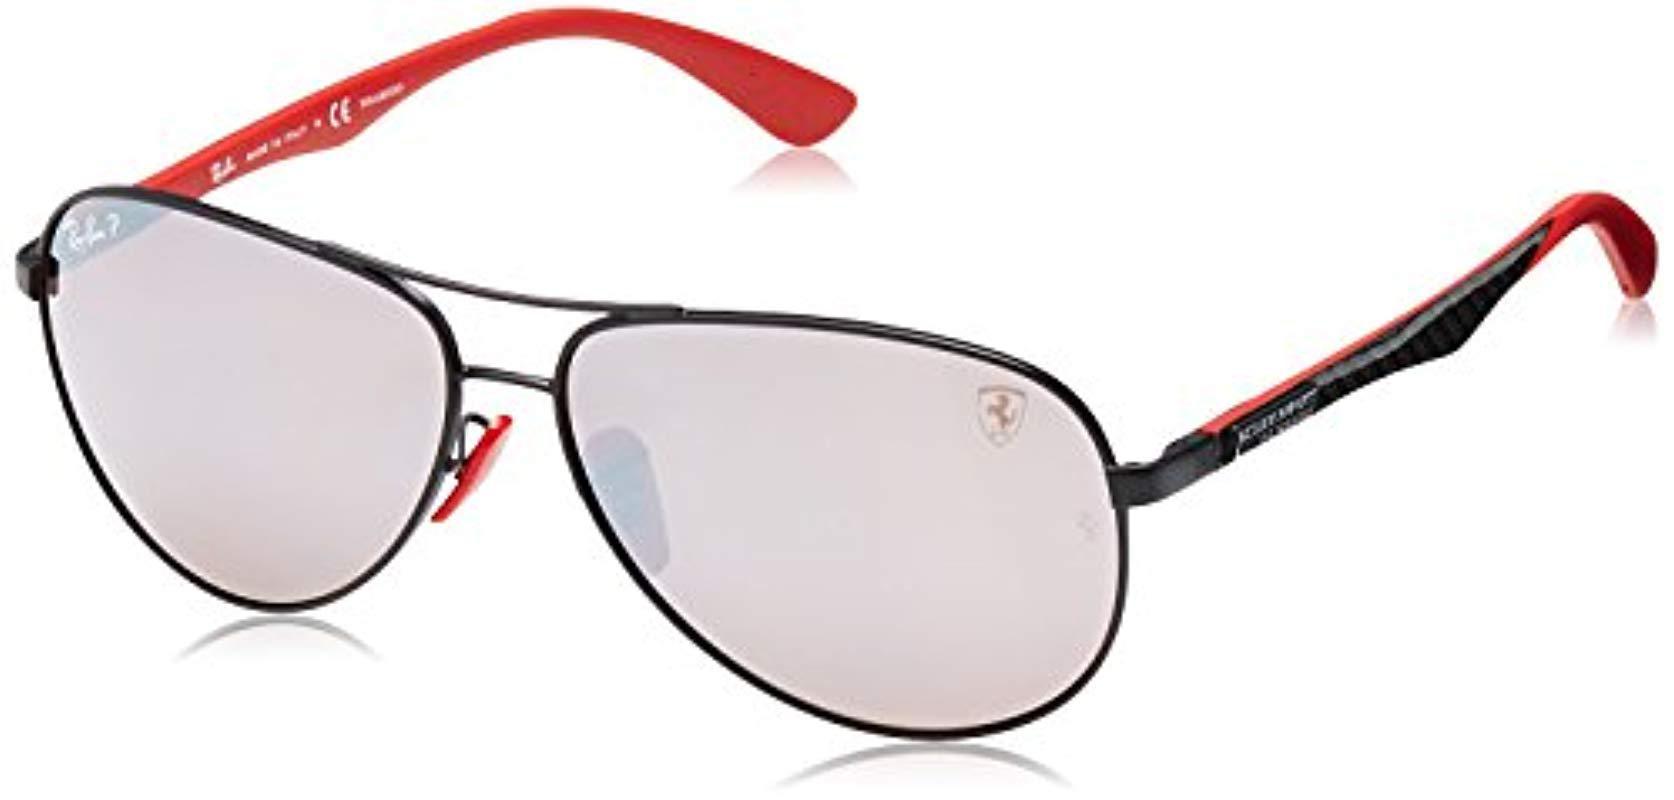 6d168217b2c Ray-Ban. Men s Black Rb8313m Scuderia Ferrari Collection Polarized  Sunglasses